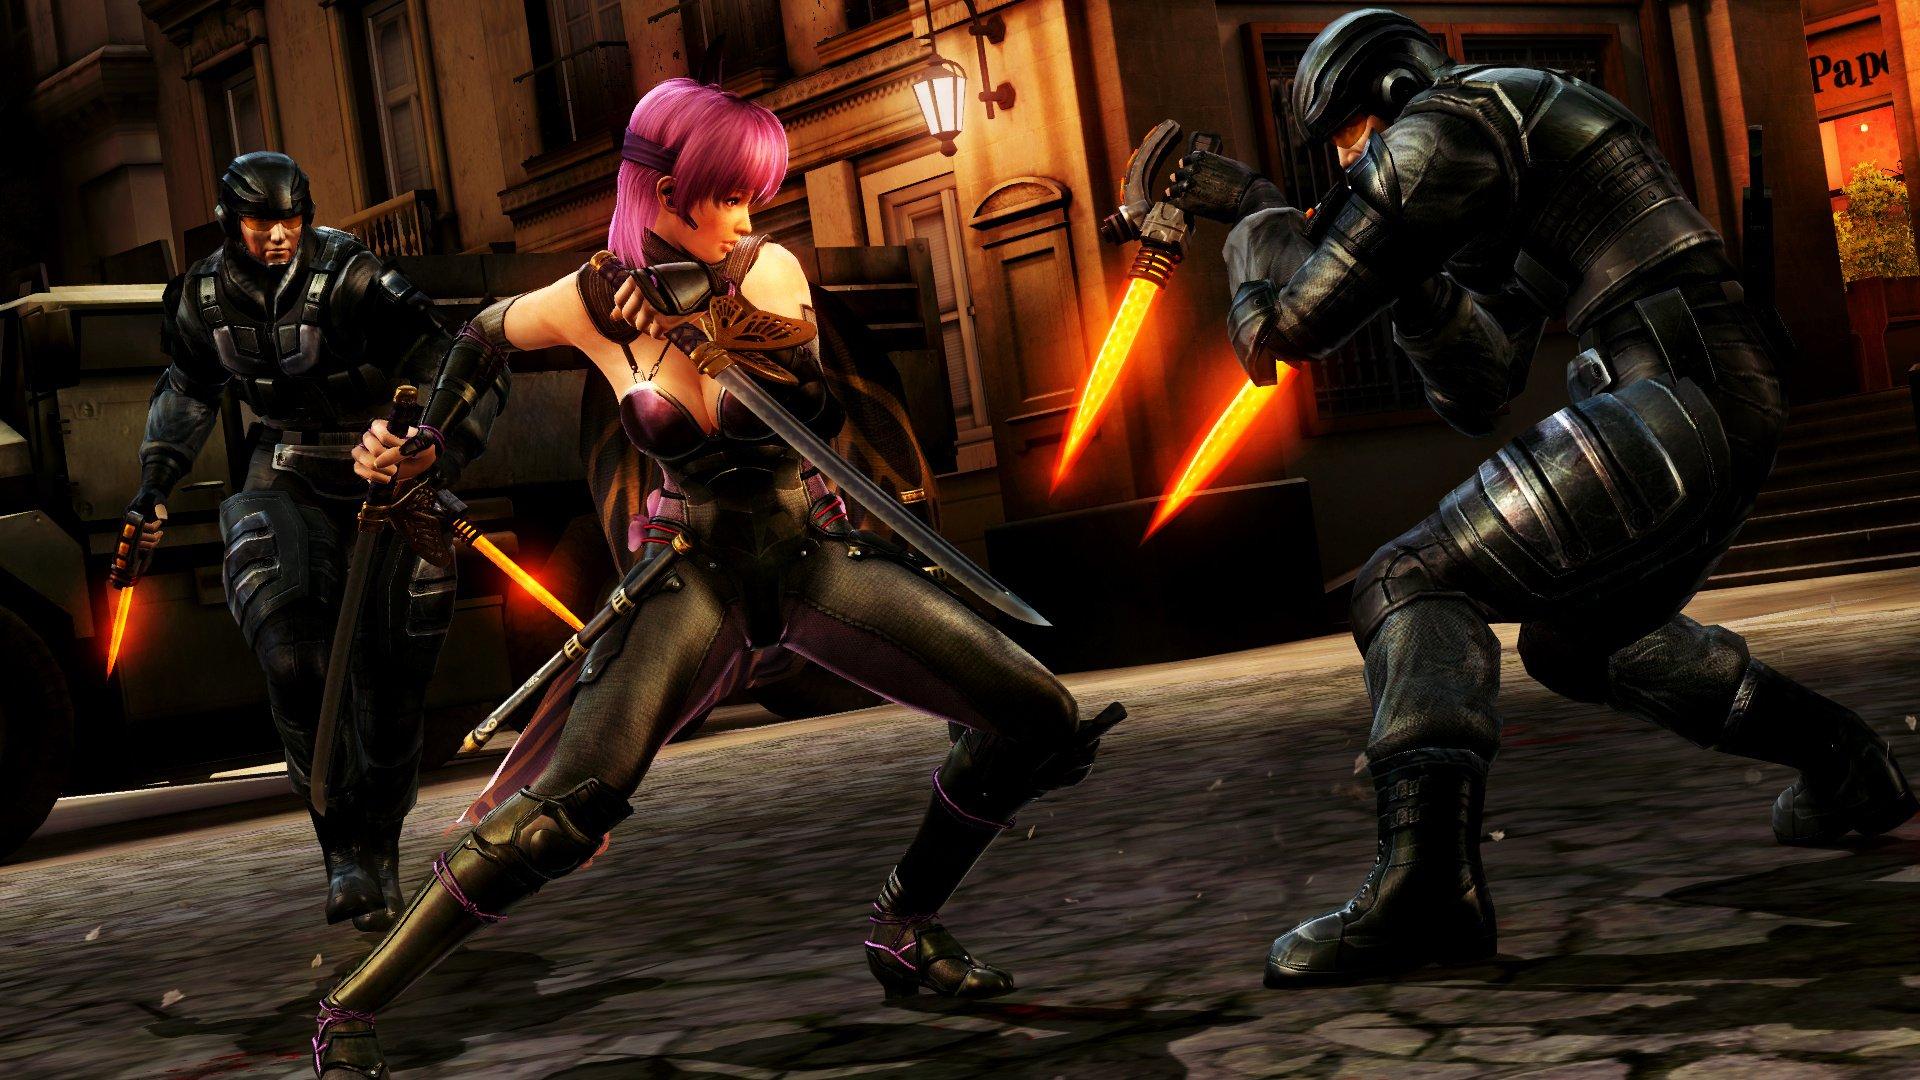 Ninja Gaiden 3: Razor's Edge (Wii U) Game Profile